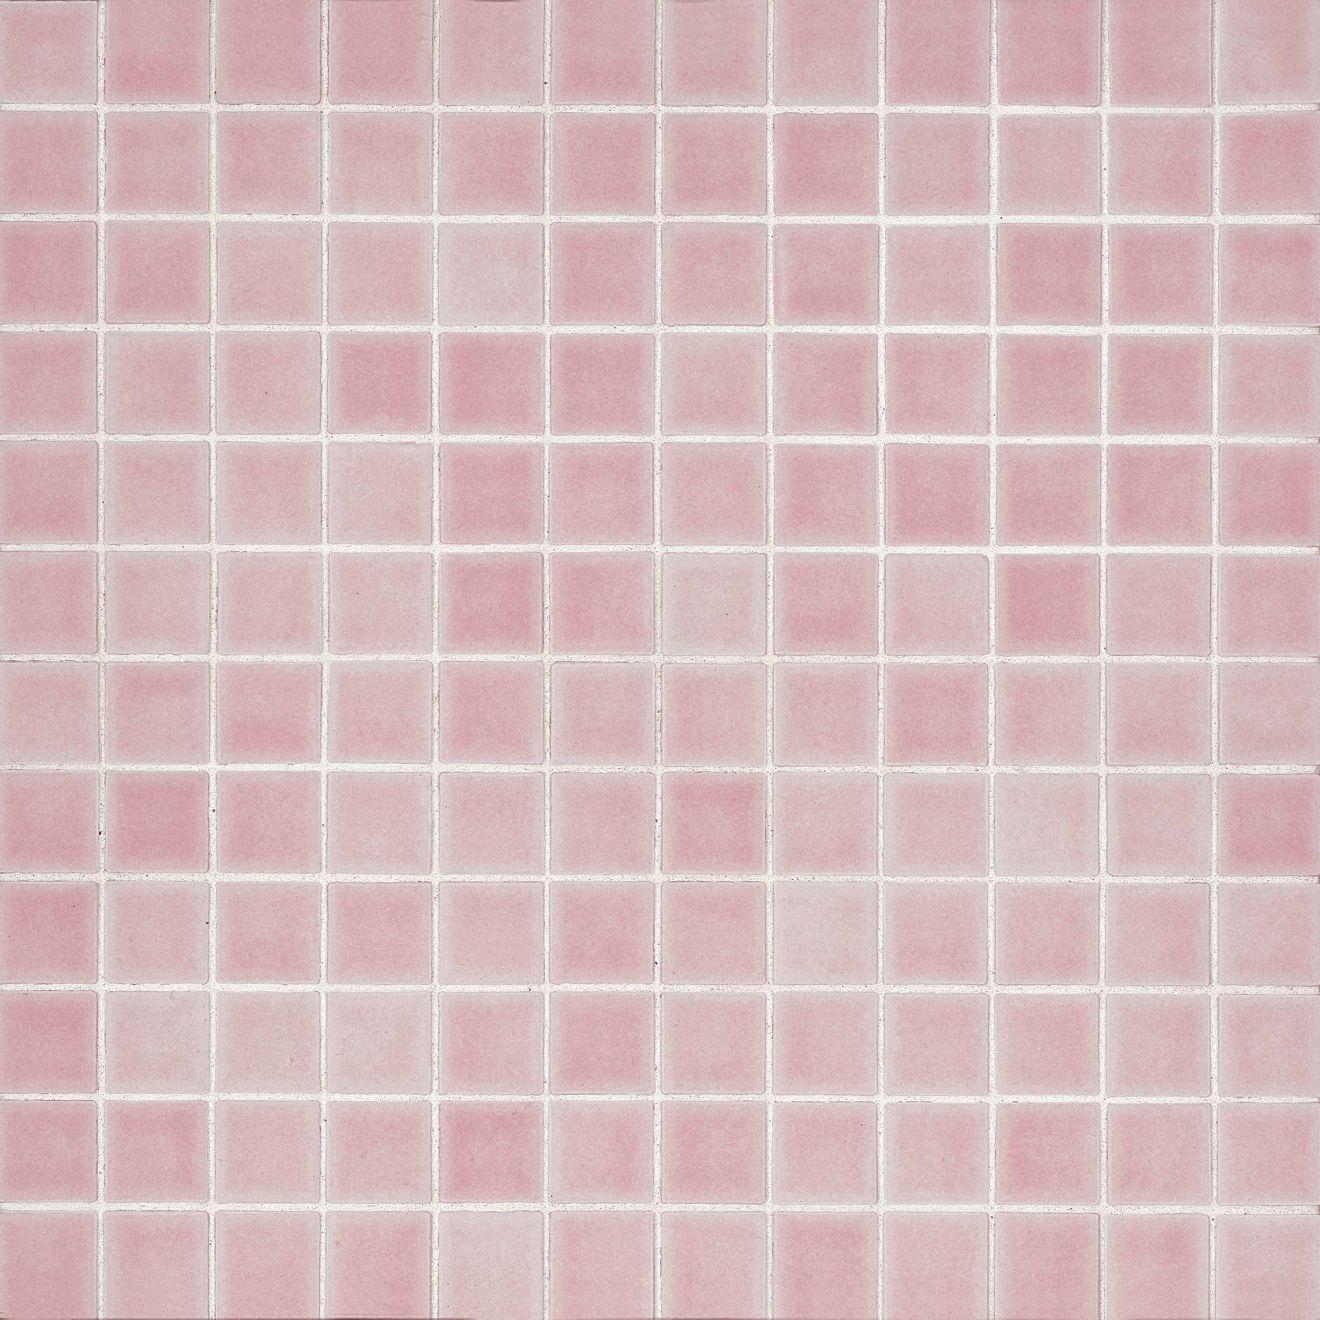 "True 1"" x 1"" Floor & Wall Mosaic in Pink"